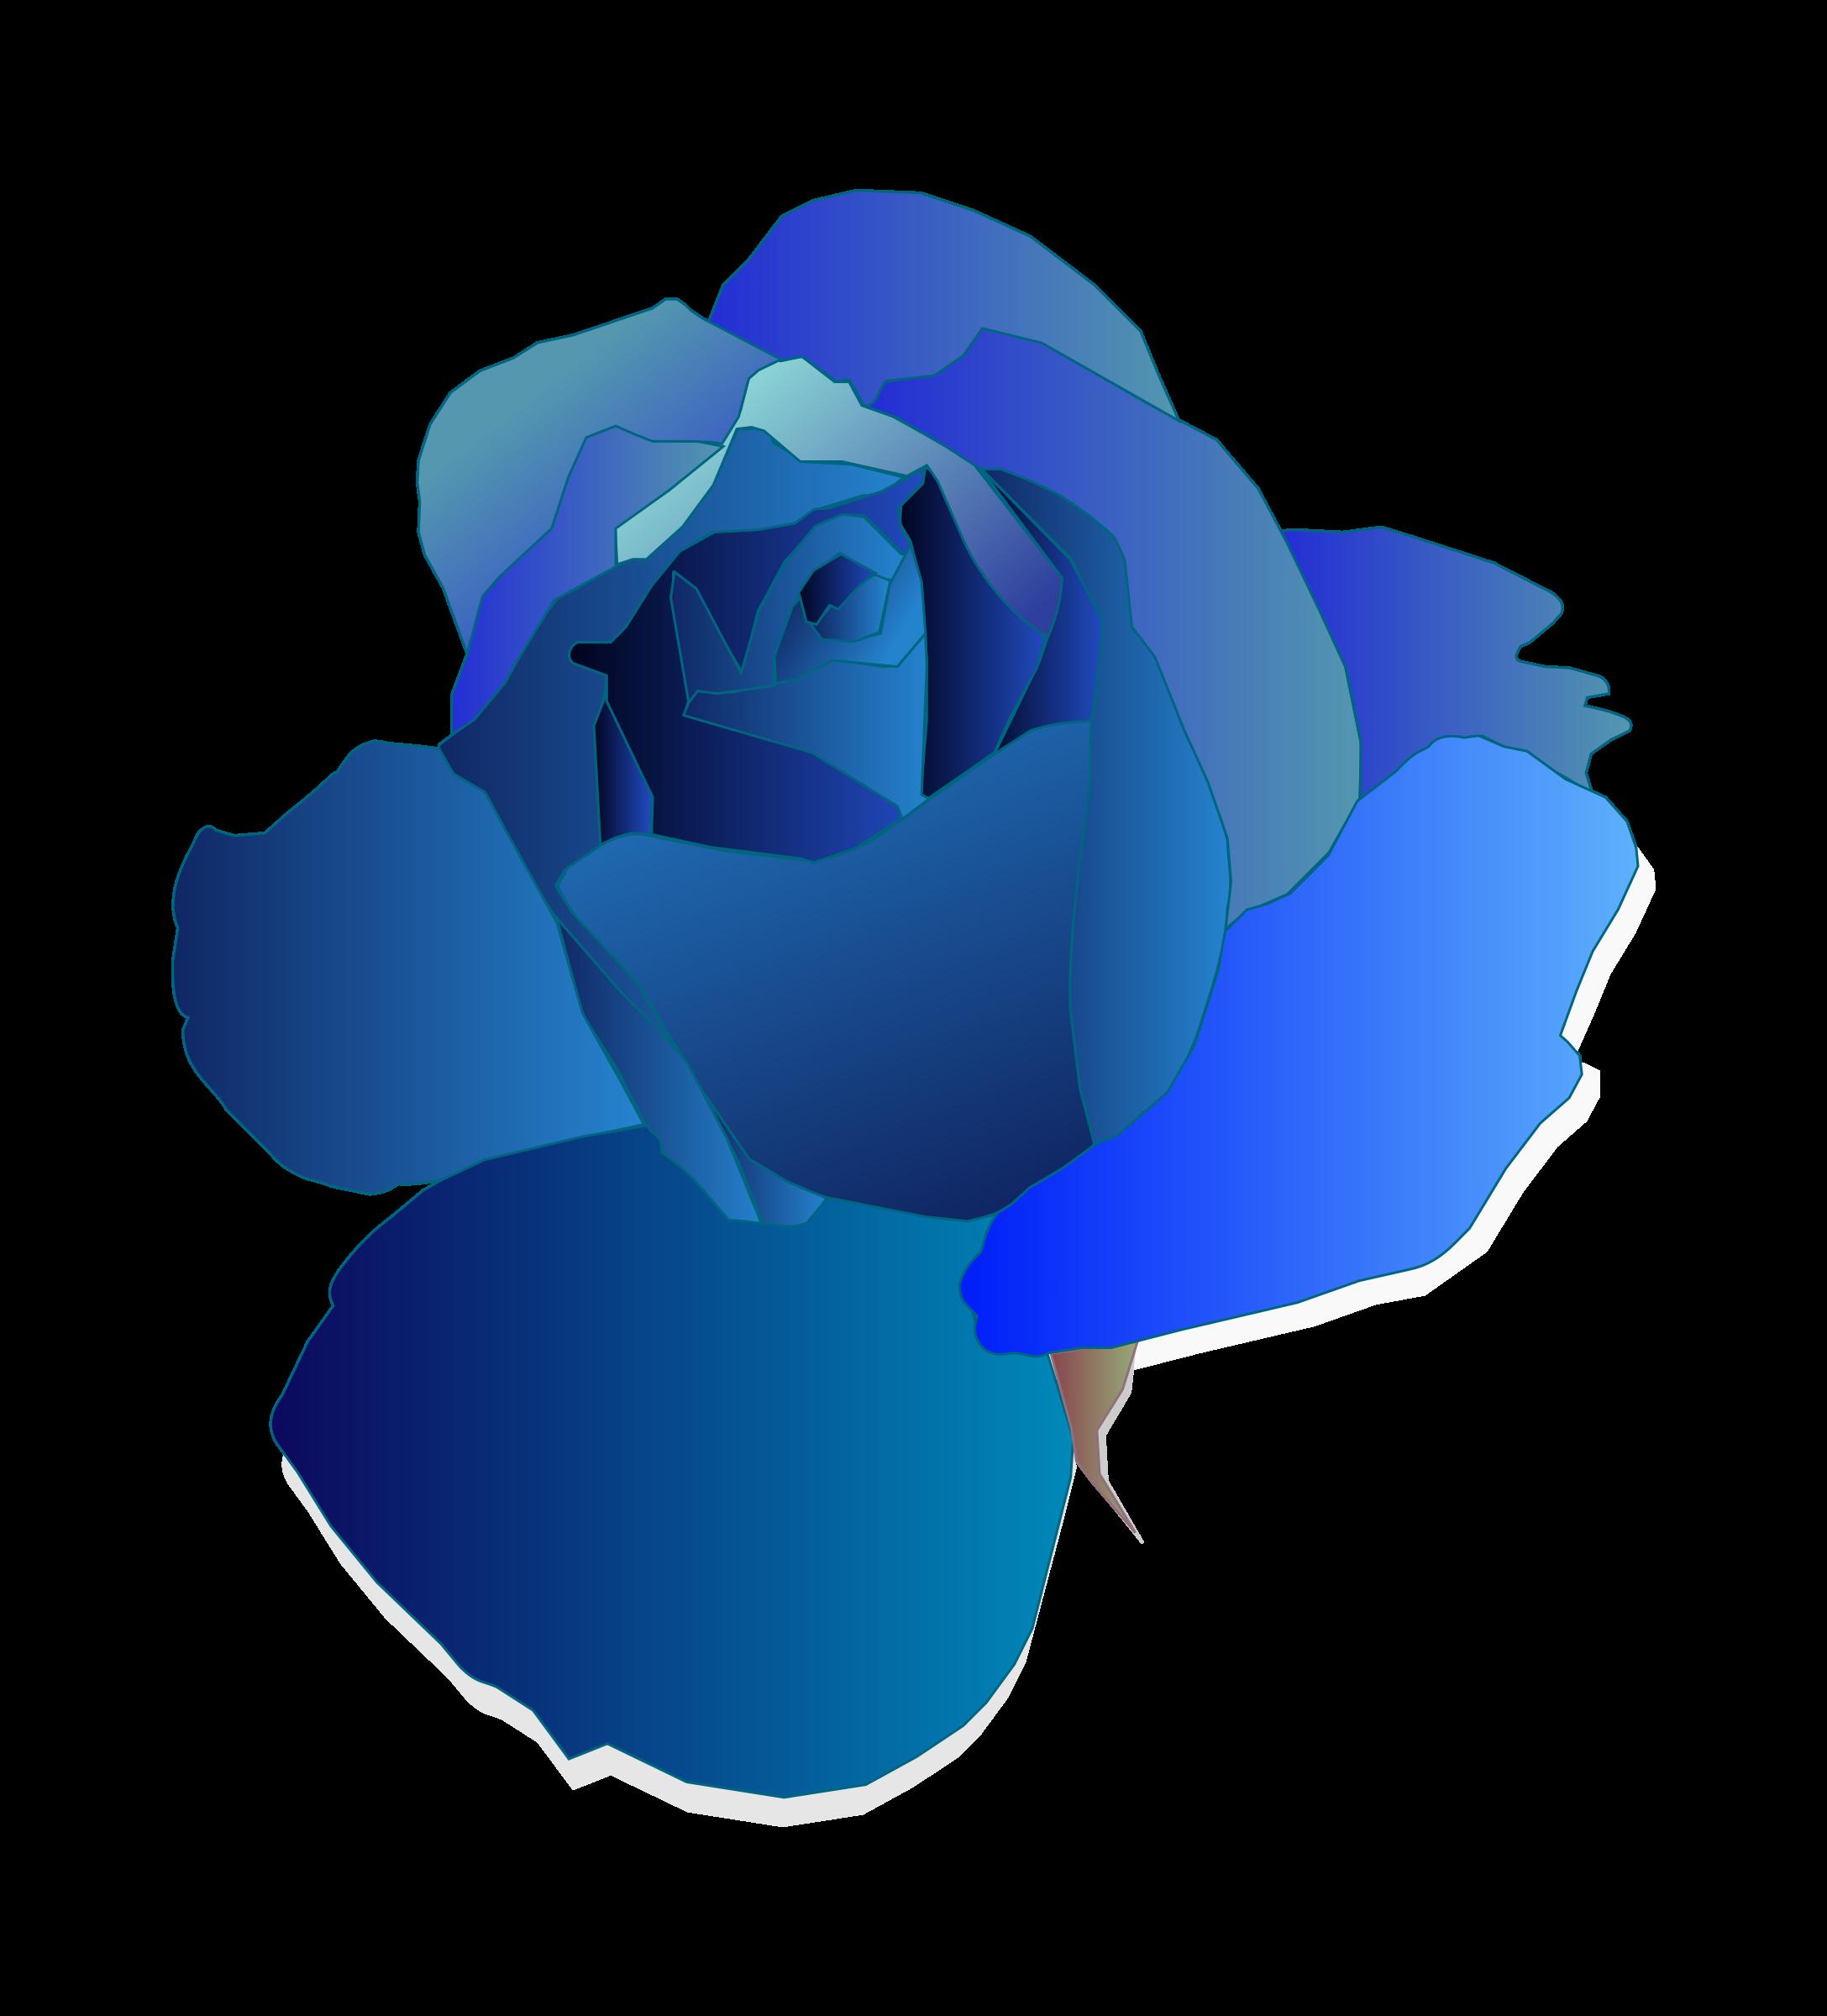 Families clipart blue. Rose